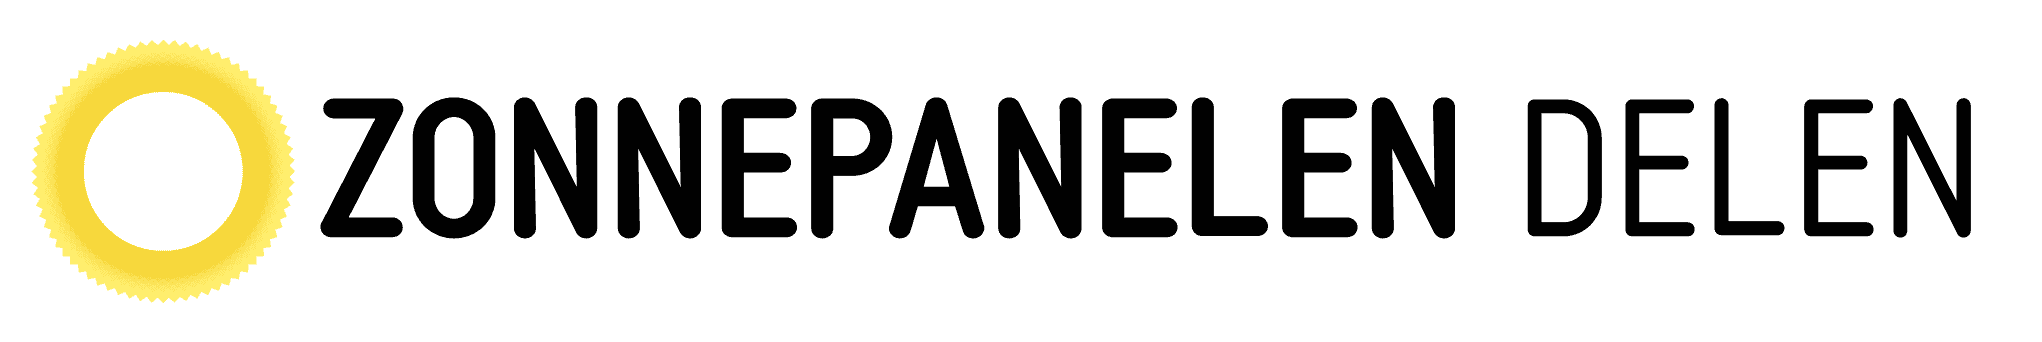 Zonnepanelendelen - Logo - Horizontaal - transparant